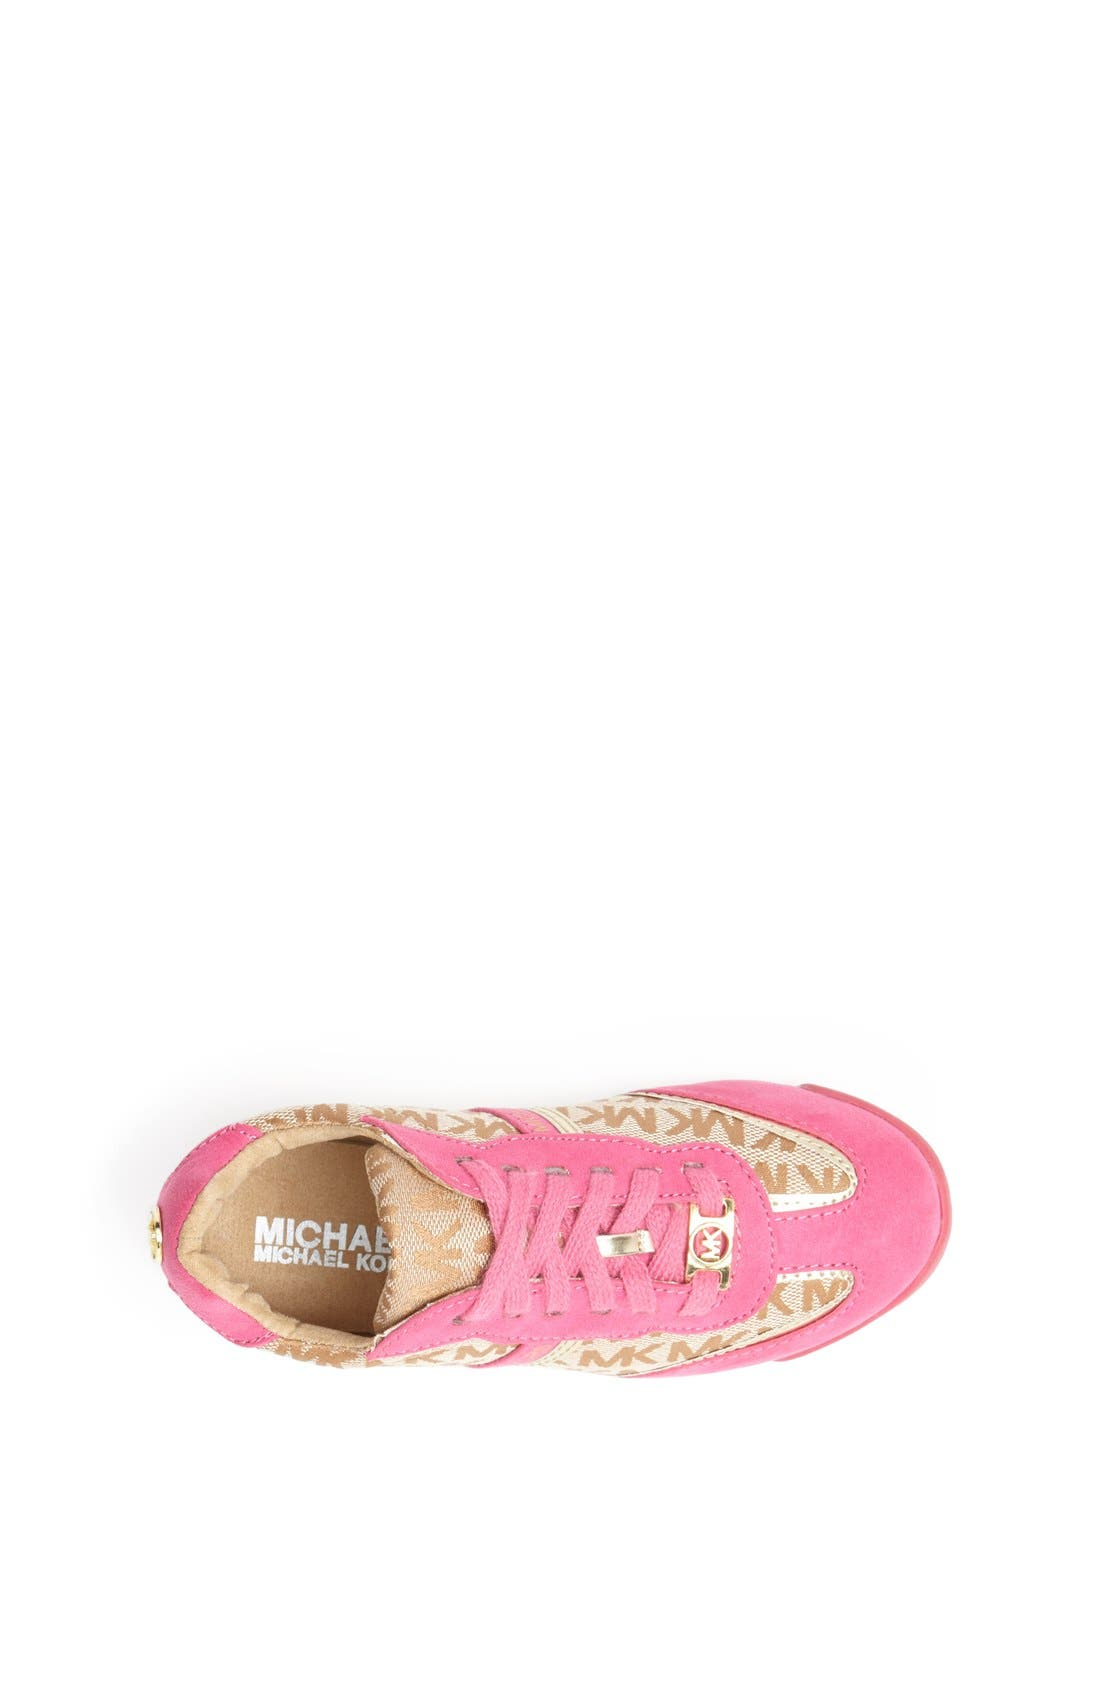 Alternate Image 3  - MICHAEL Michael Kors 'Alexia' Sneaker (Walker, Toddler, Little Kid & Big Kid)